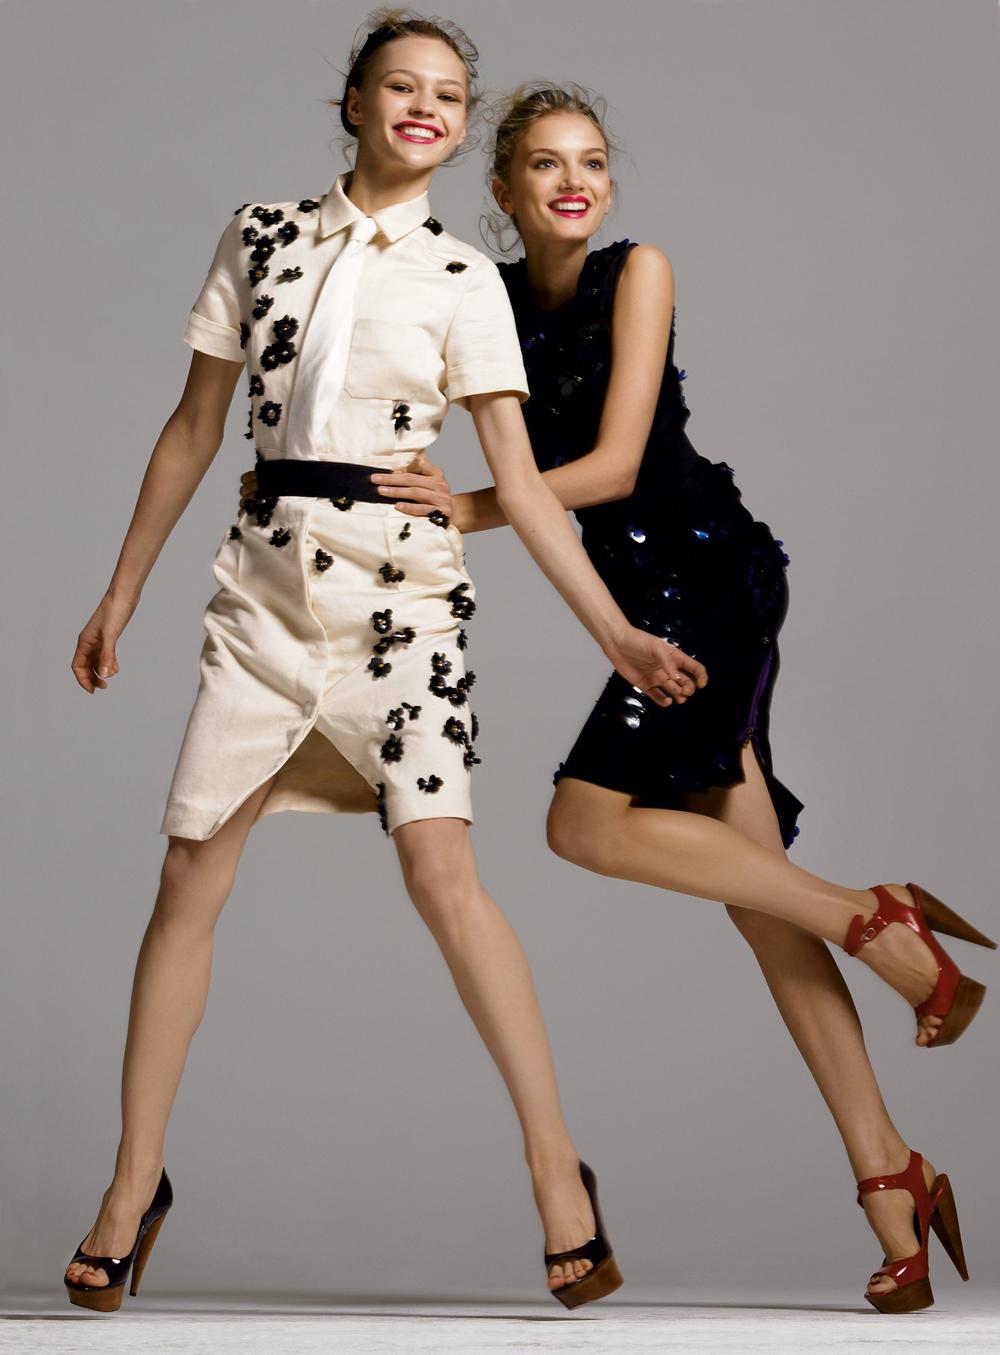 Sasha Pivovarova & Lily Donaldson in Lanvin by Alber Elbaz in Vogue US April 2006 (photography: Steven Meisel) via www.fashionedbylove.co.uk